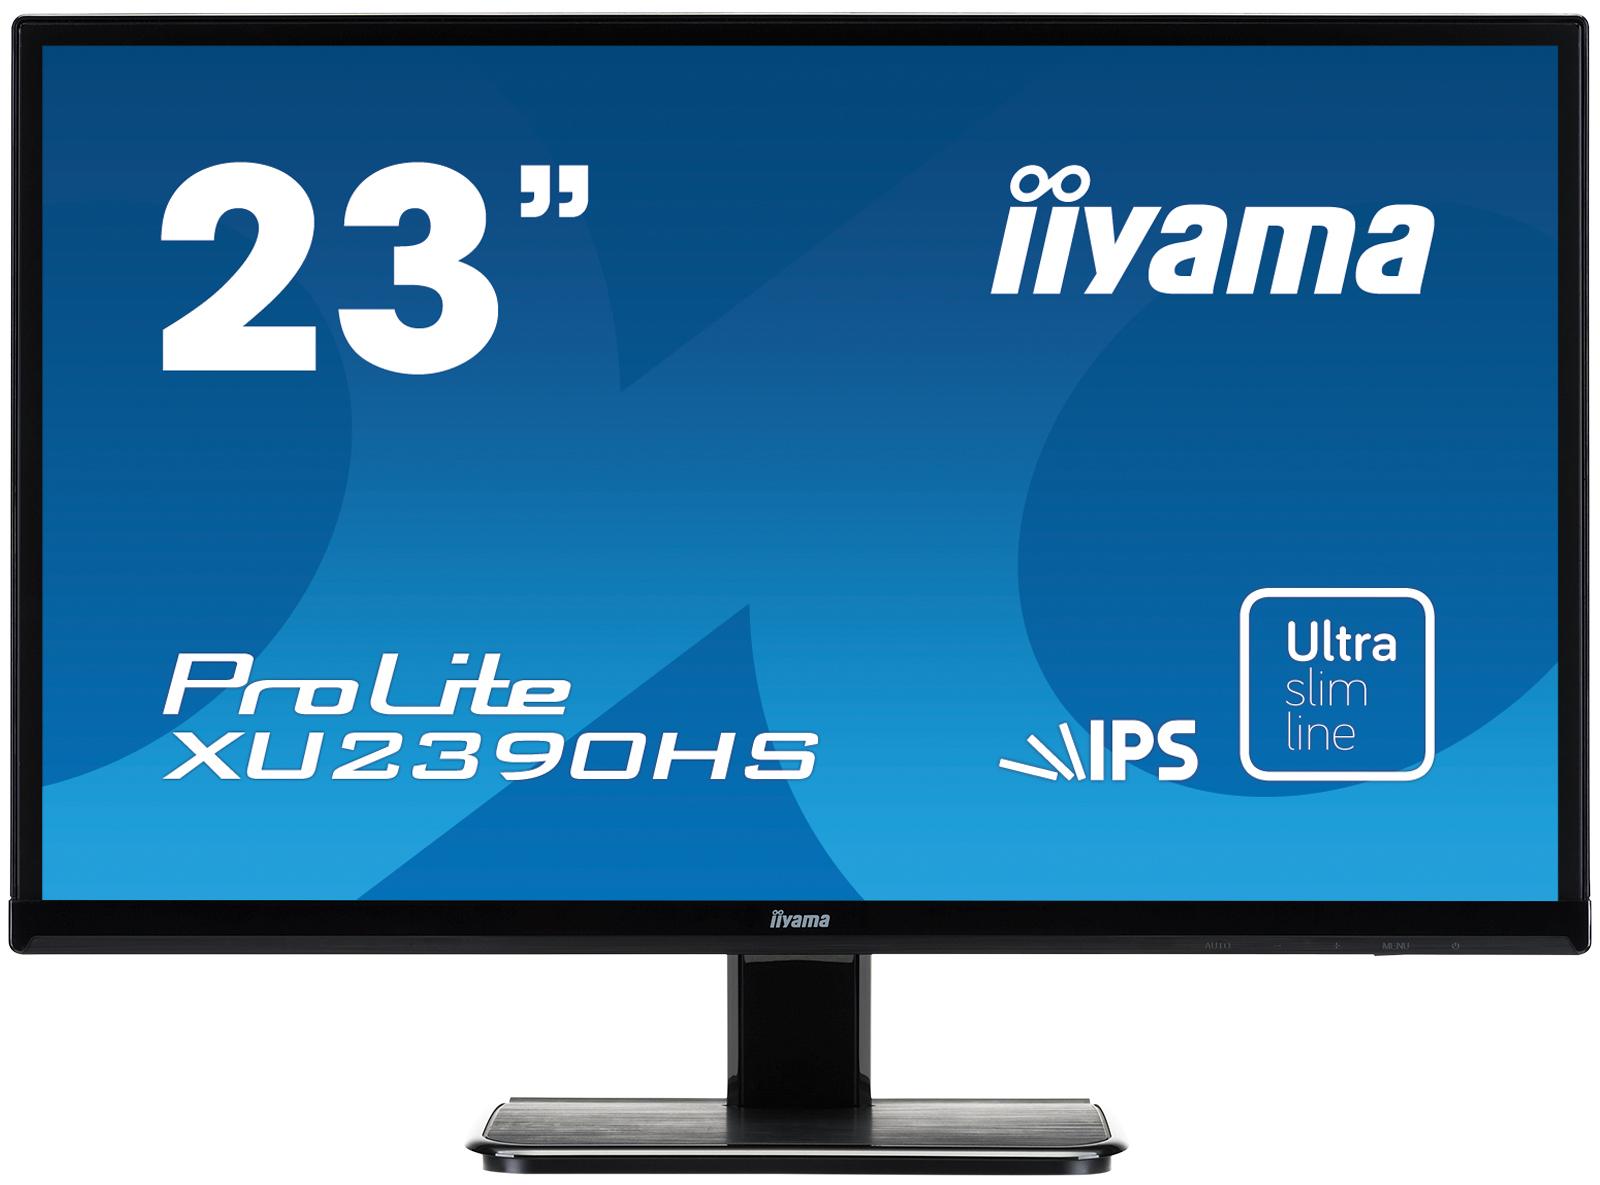 IIYAMA Prolite XU2390HS-B1 58,4cm 23Zoll IPS LED 1920x1080 250cd/m  5ms Speaker 2x2W VGA DVI HDMI